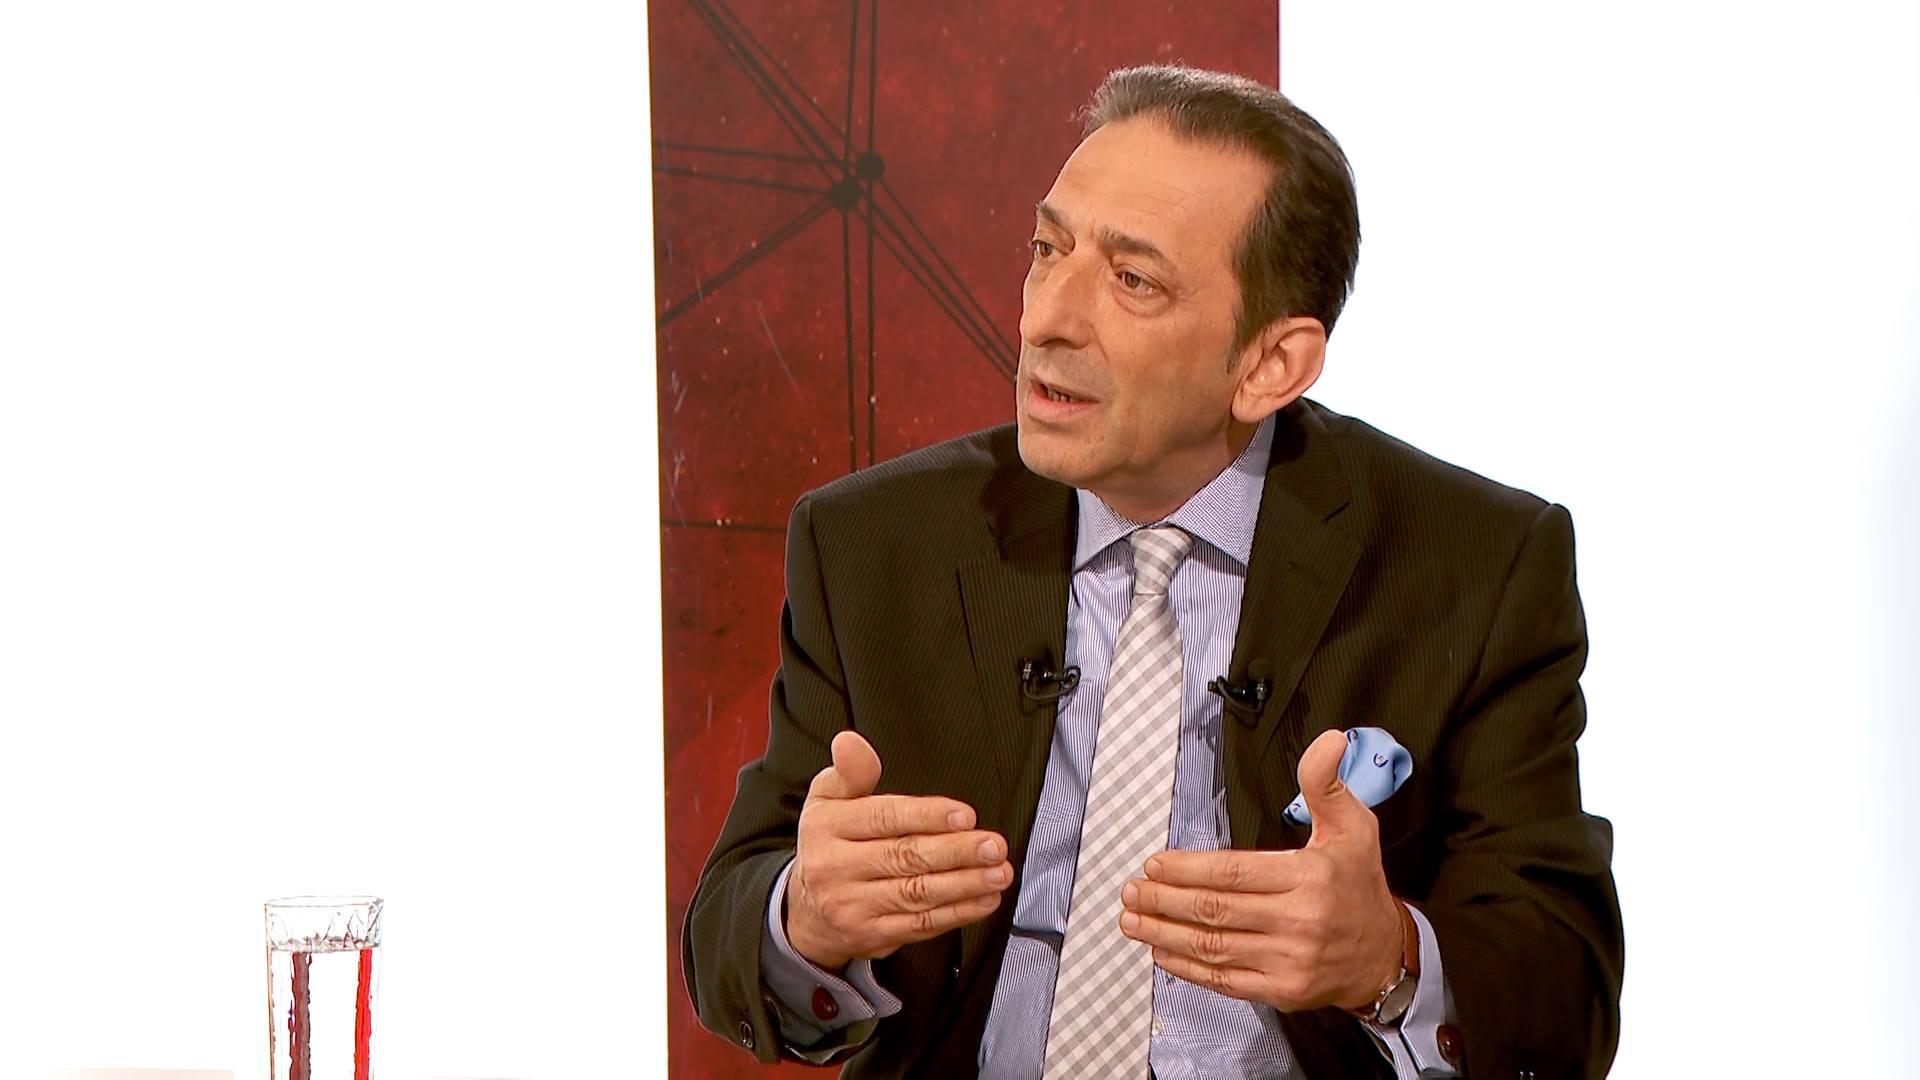 Blerim Reka: Δεν θα δοθεί ημερομηνία για την έναρξη ενταξιακών διαπραγματεύσεων